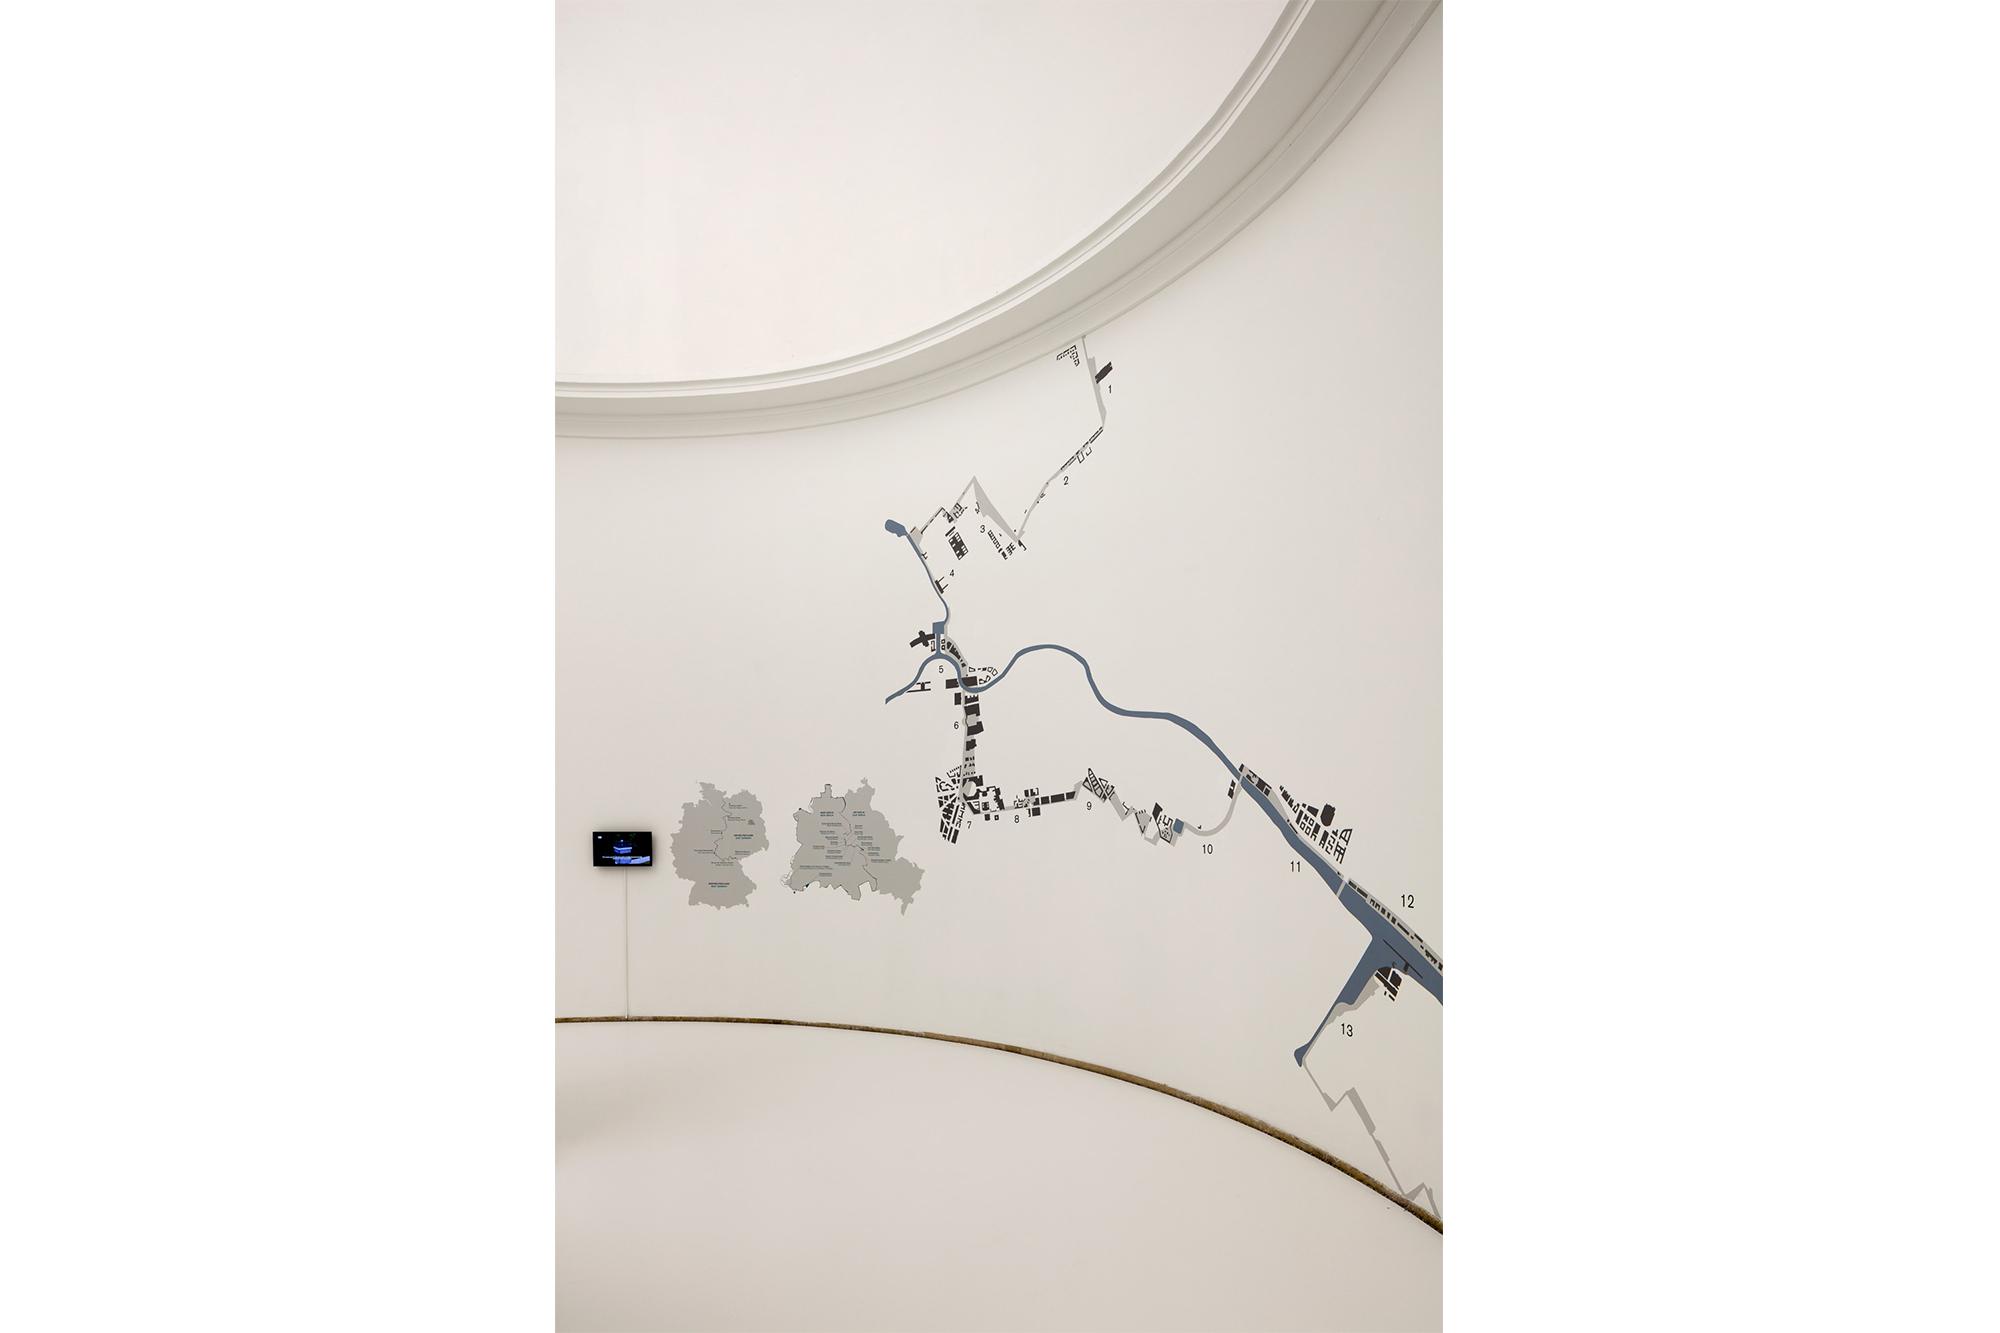 16-German Pavilion-Biennale Architettura 2018-c-Jan Bitter-1